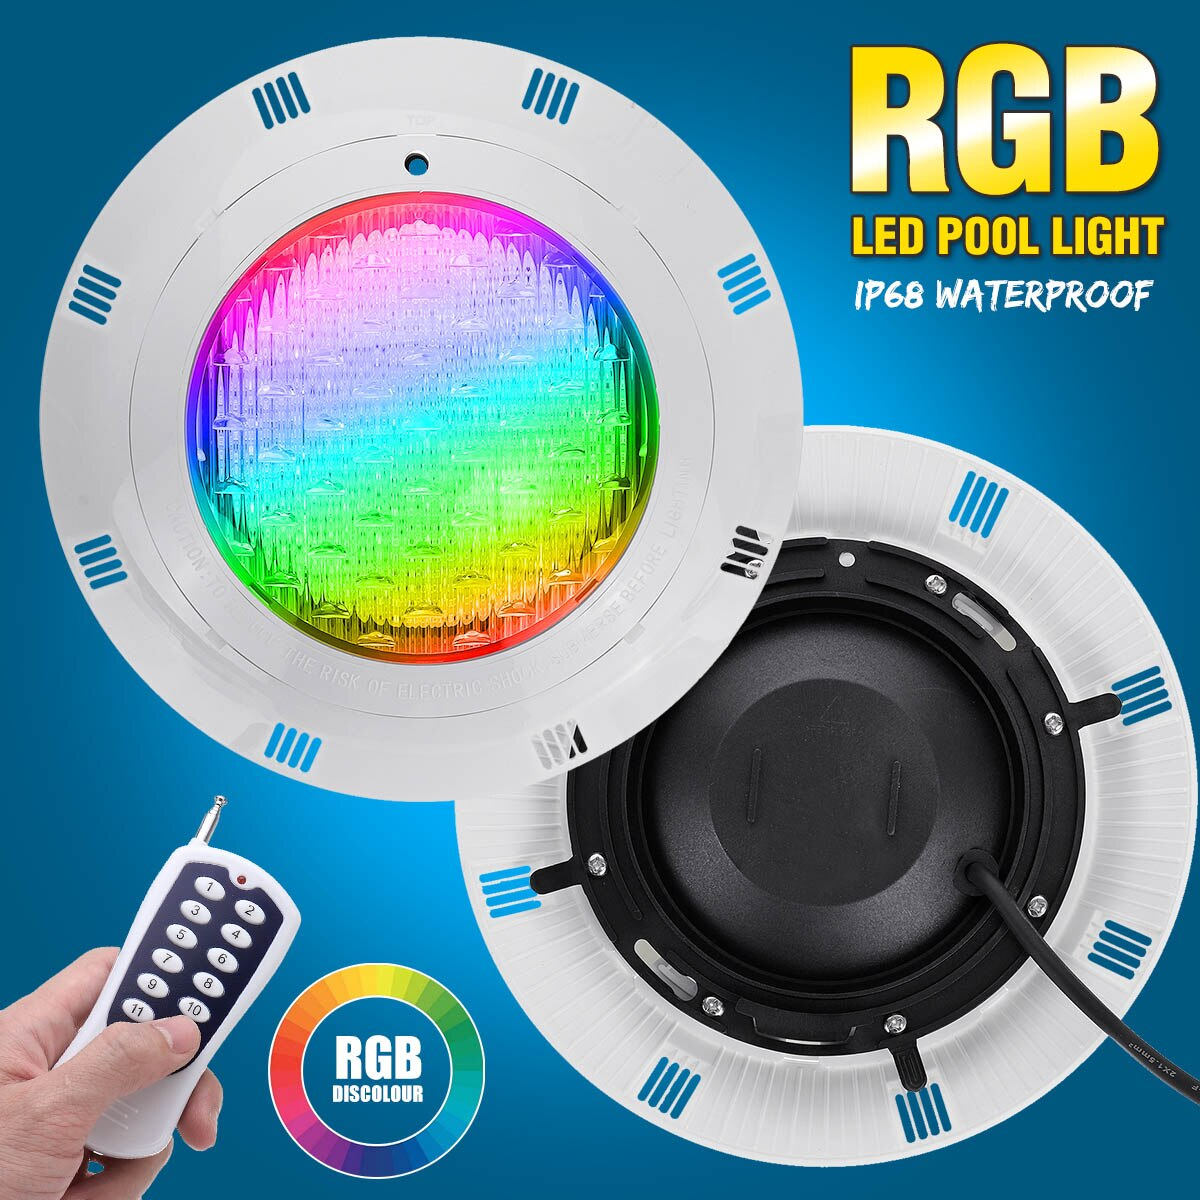 45W RGB Led Swimming Pool Light 450LED IP68 Waterproof AC12V-24V Outdoor RGB UnderWater Light Pond Led Piscina Luz Spotlight